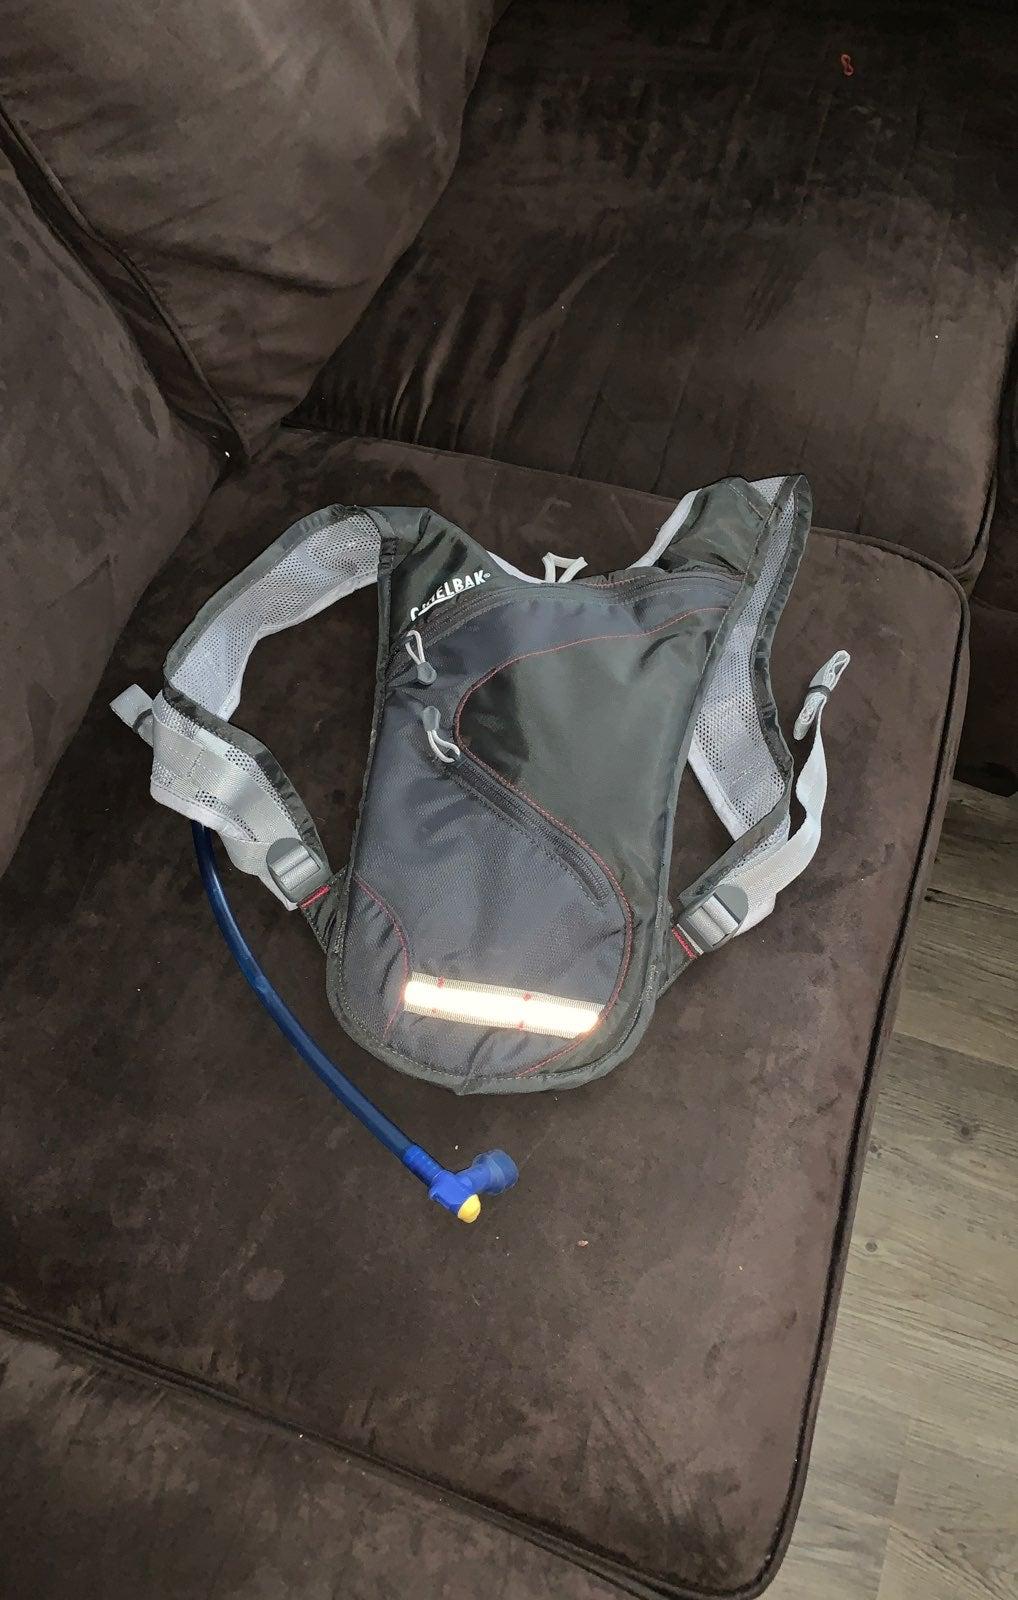 Camelbak hydradtion hiking bag